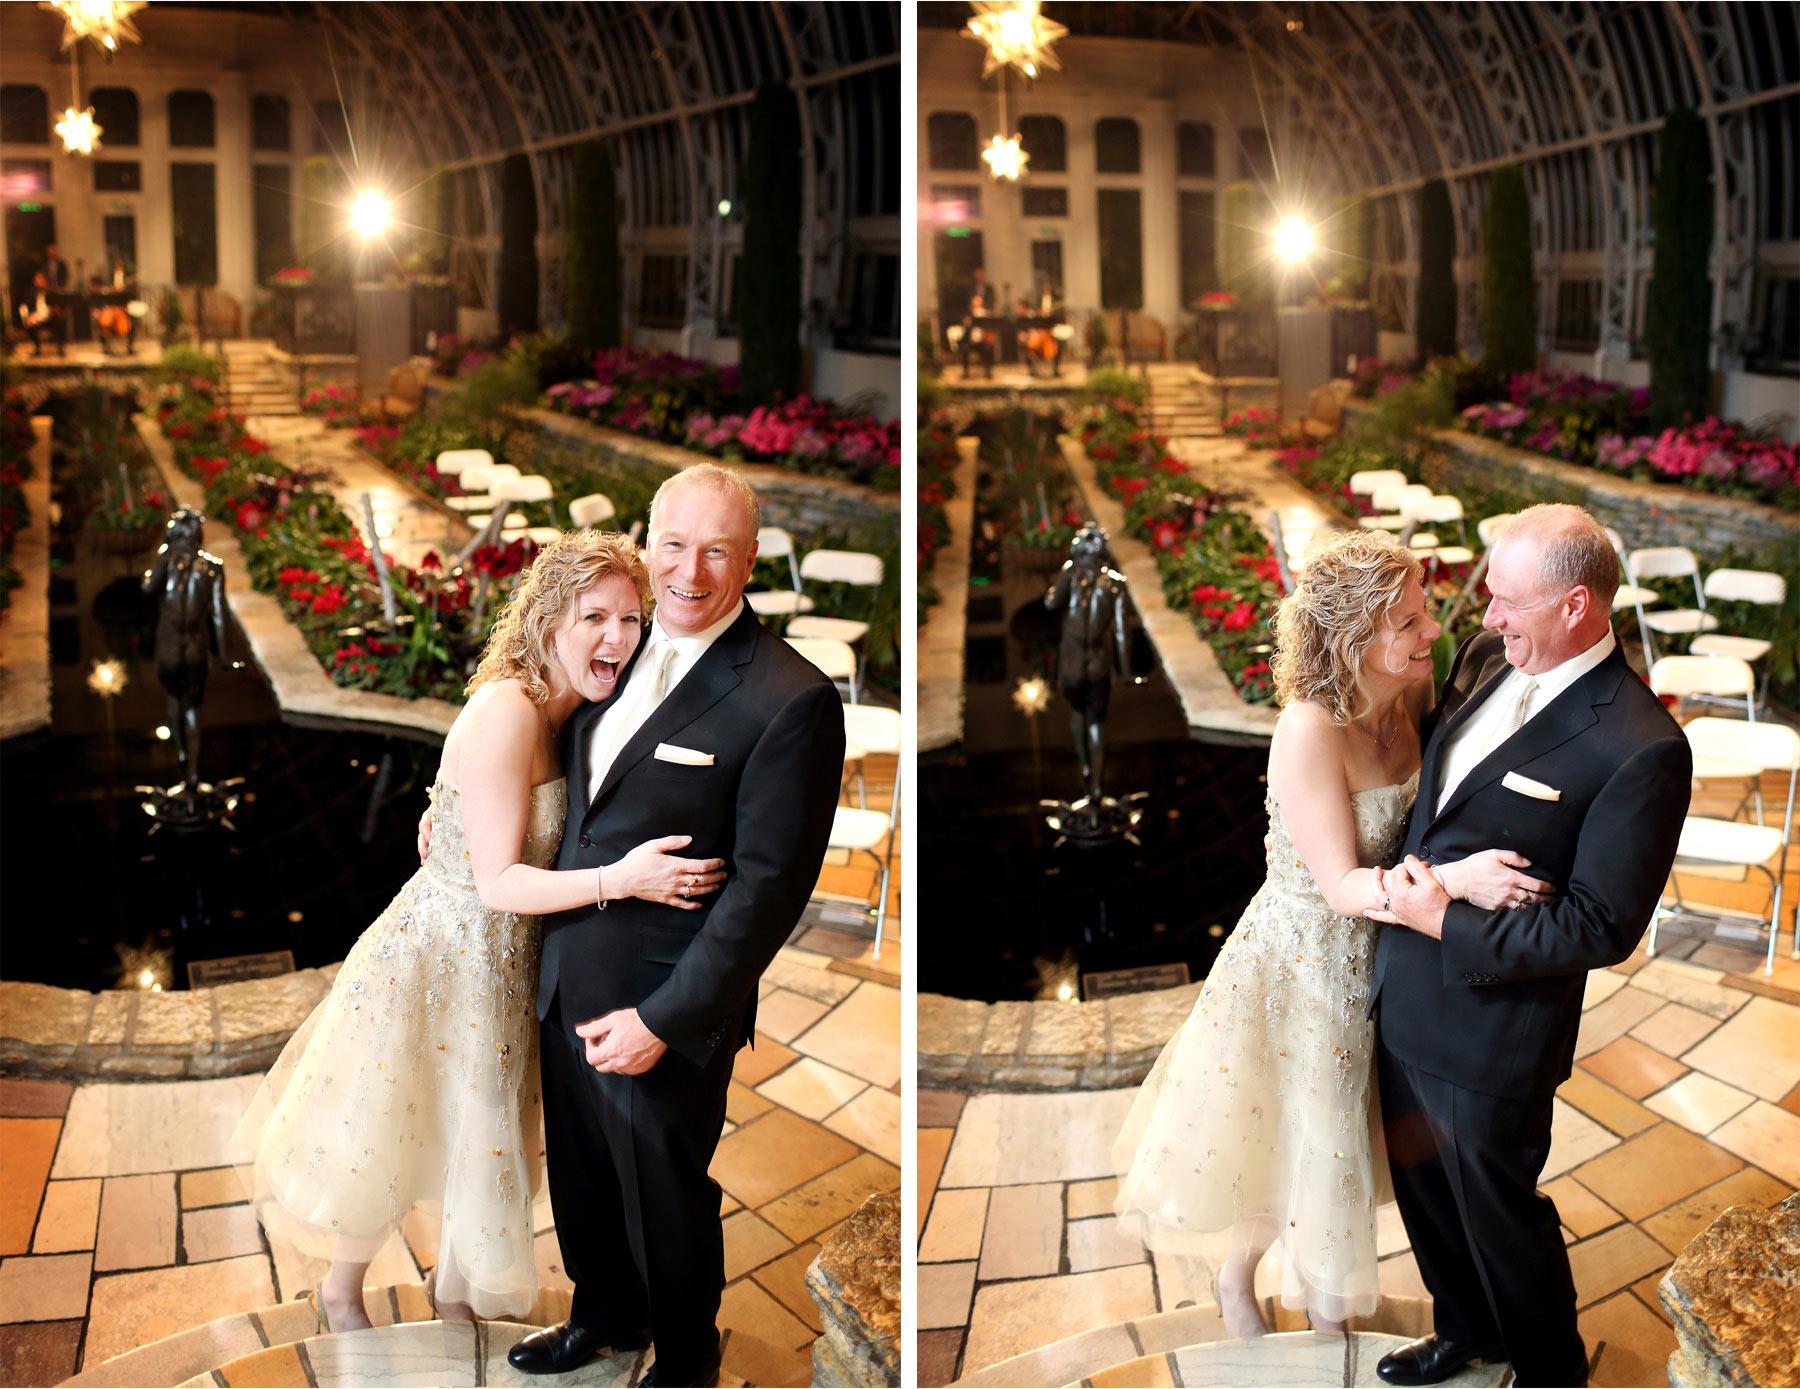 18-Saint-Paul-Minnesota-Wedding-Photographer-by-Andrew-Vick-Photography-Winter-Como-Park-Conservatory-Sunken-Garden-Bride-Groom-Excitement-Flowers-Night-Dannette-and-Darren.jpg